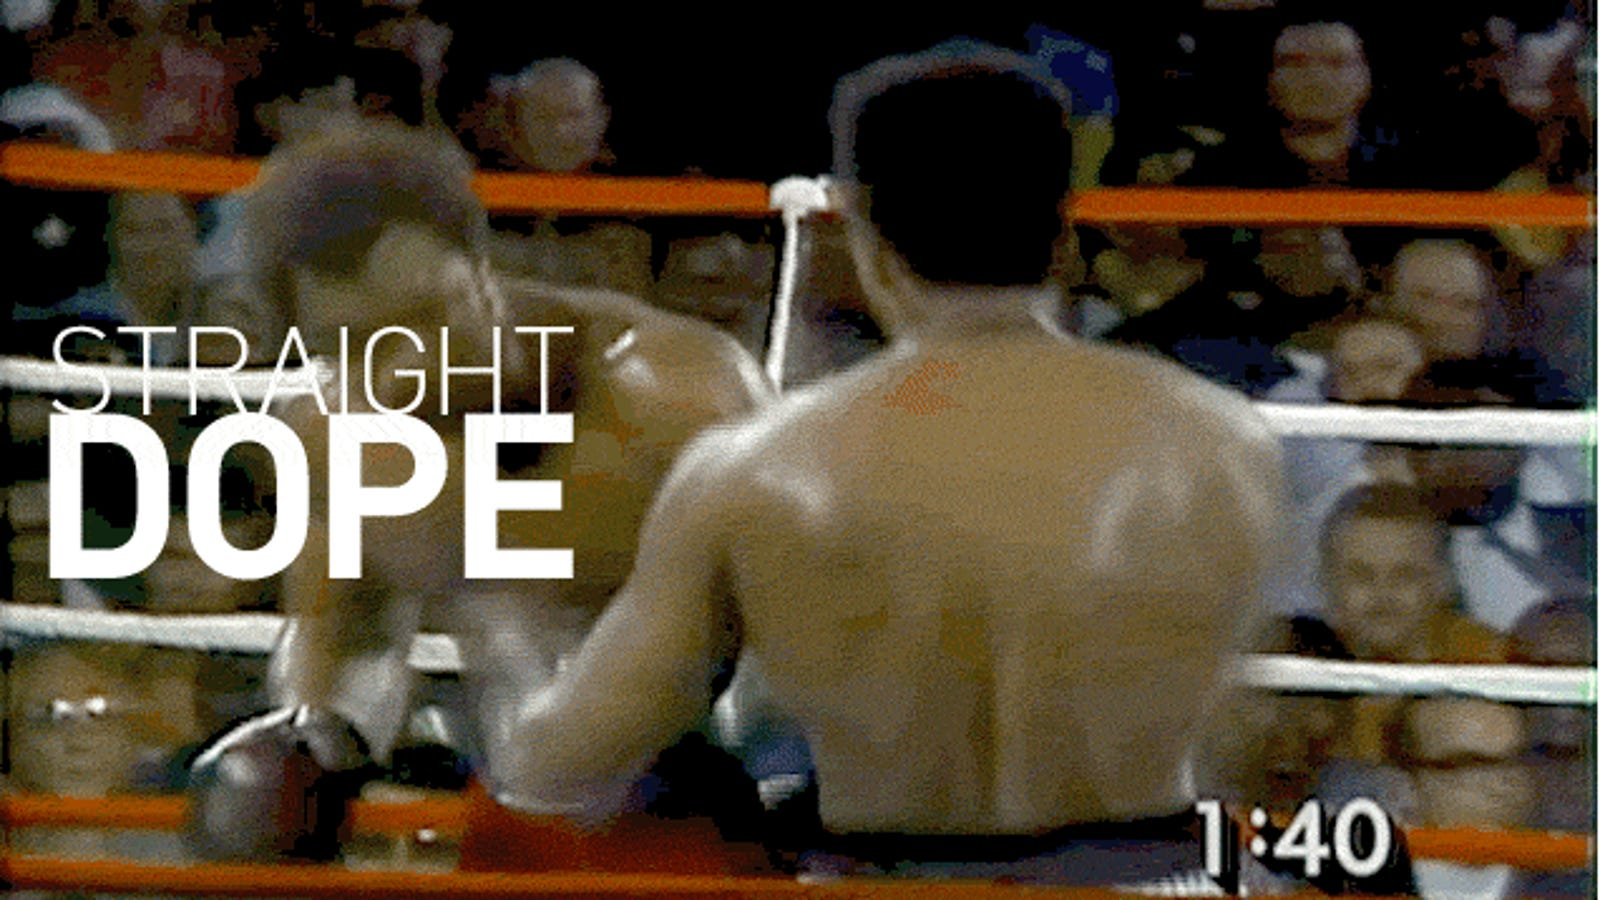 How Muhammad Ali's Rope-A-Dope Myth Suckered America